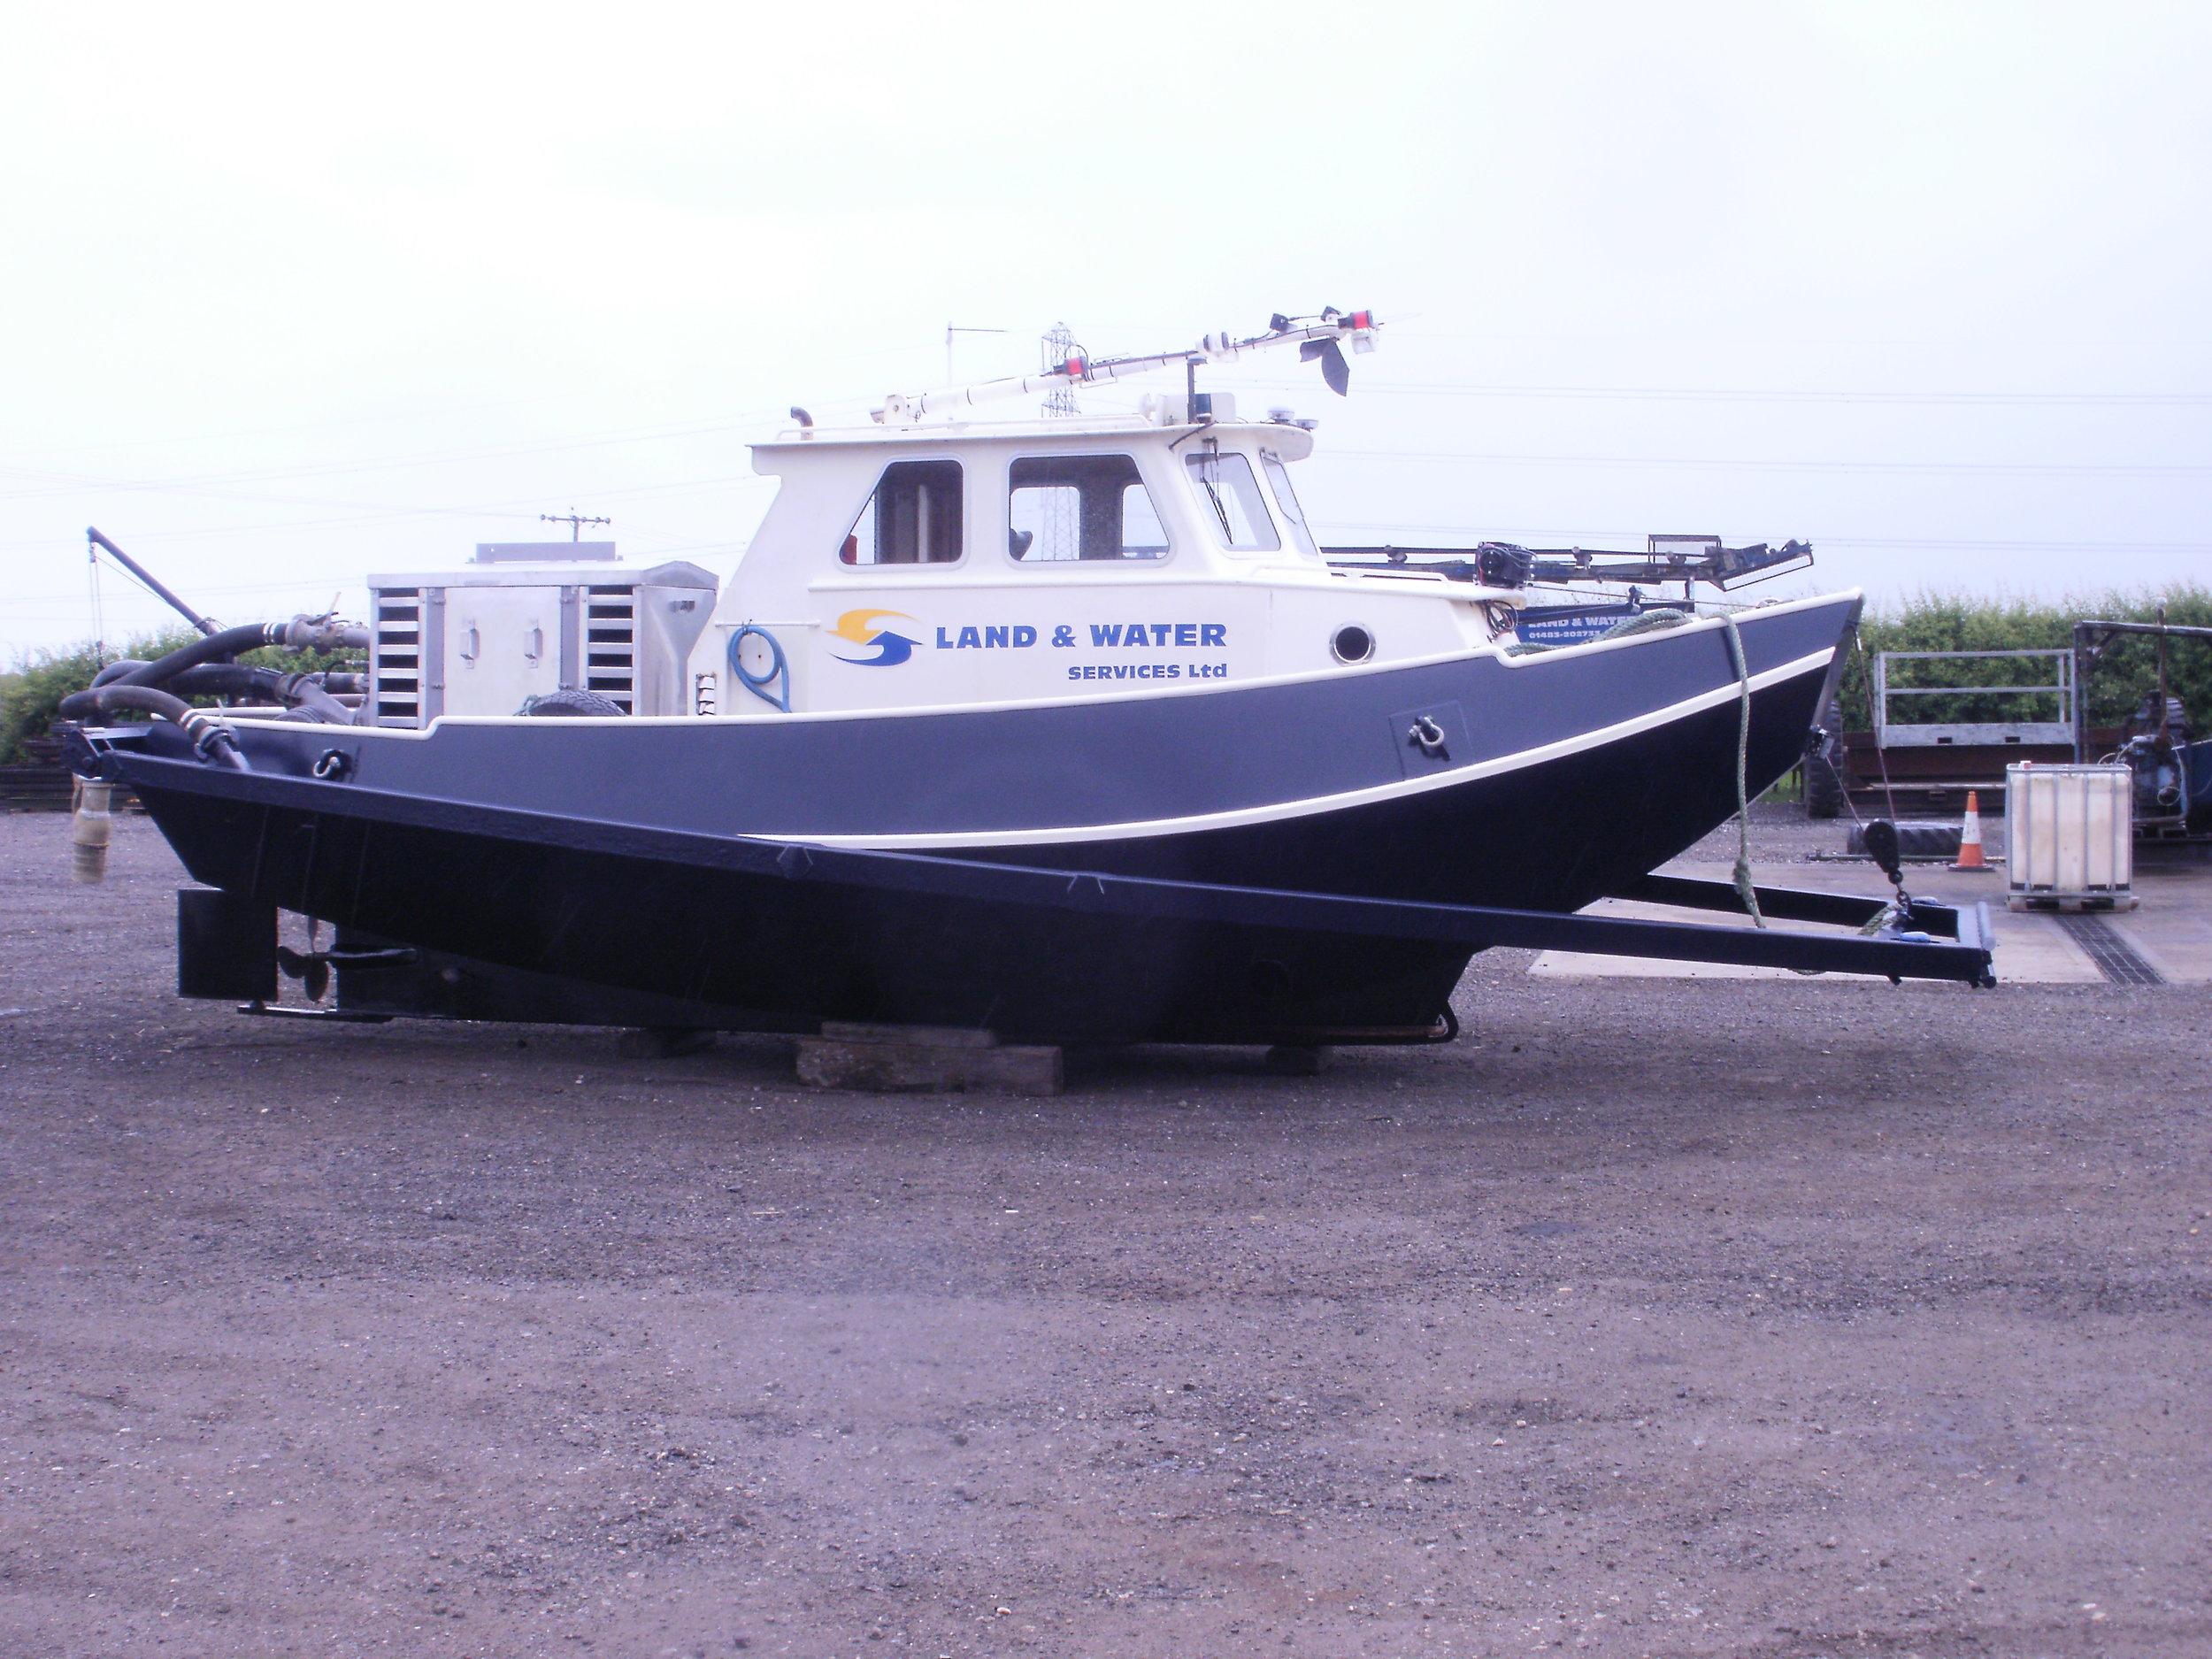 Specialist marine modifications